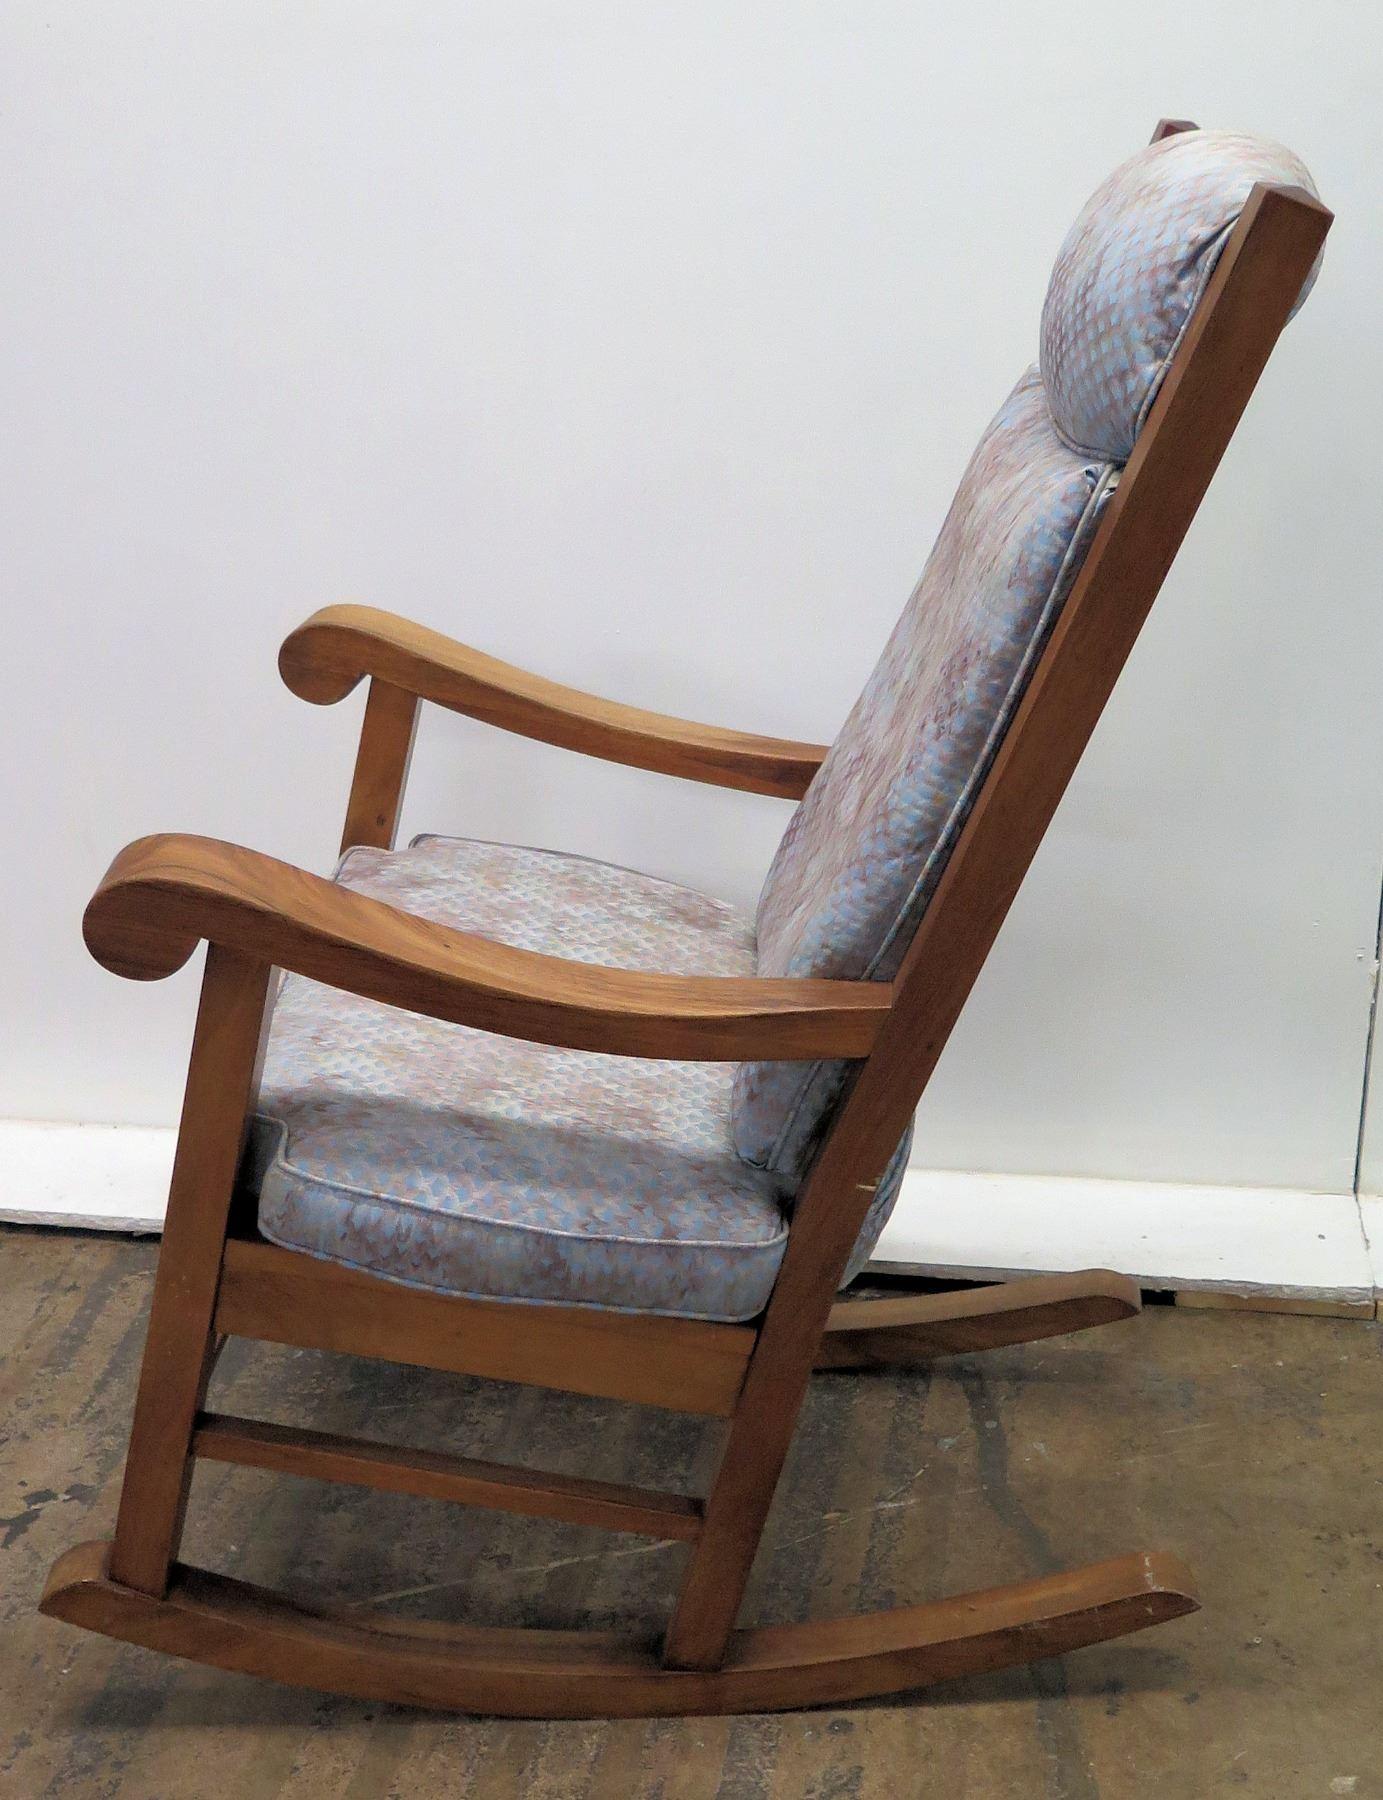 Miraculous Koa Wood Rocking Chair W Scroll Armrests By Martin Machost Co Dining Chair Design Ideas Machostcouk